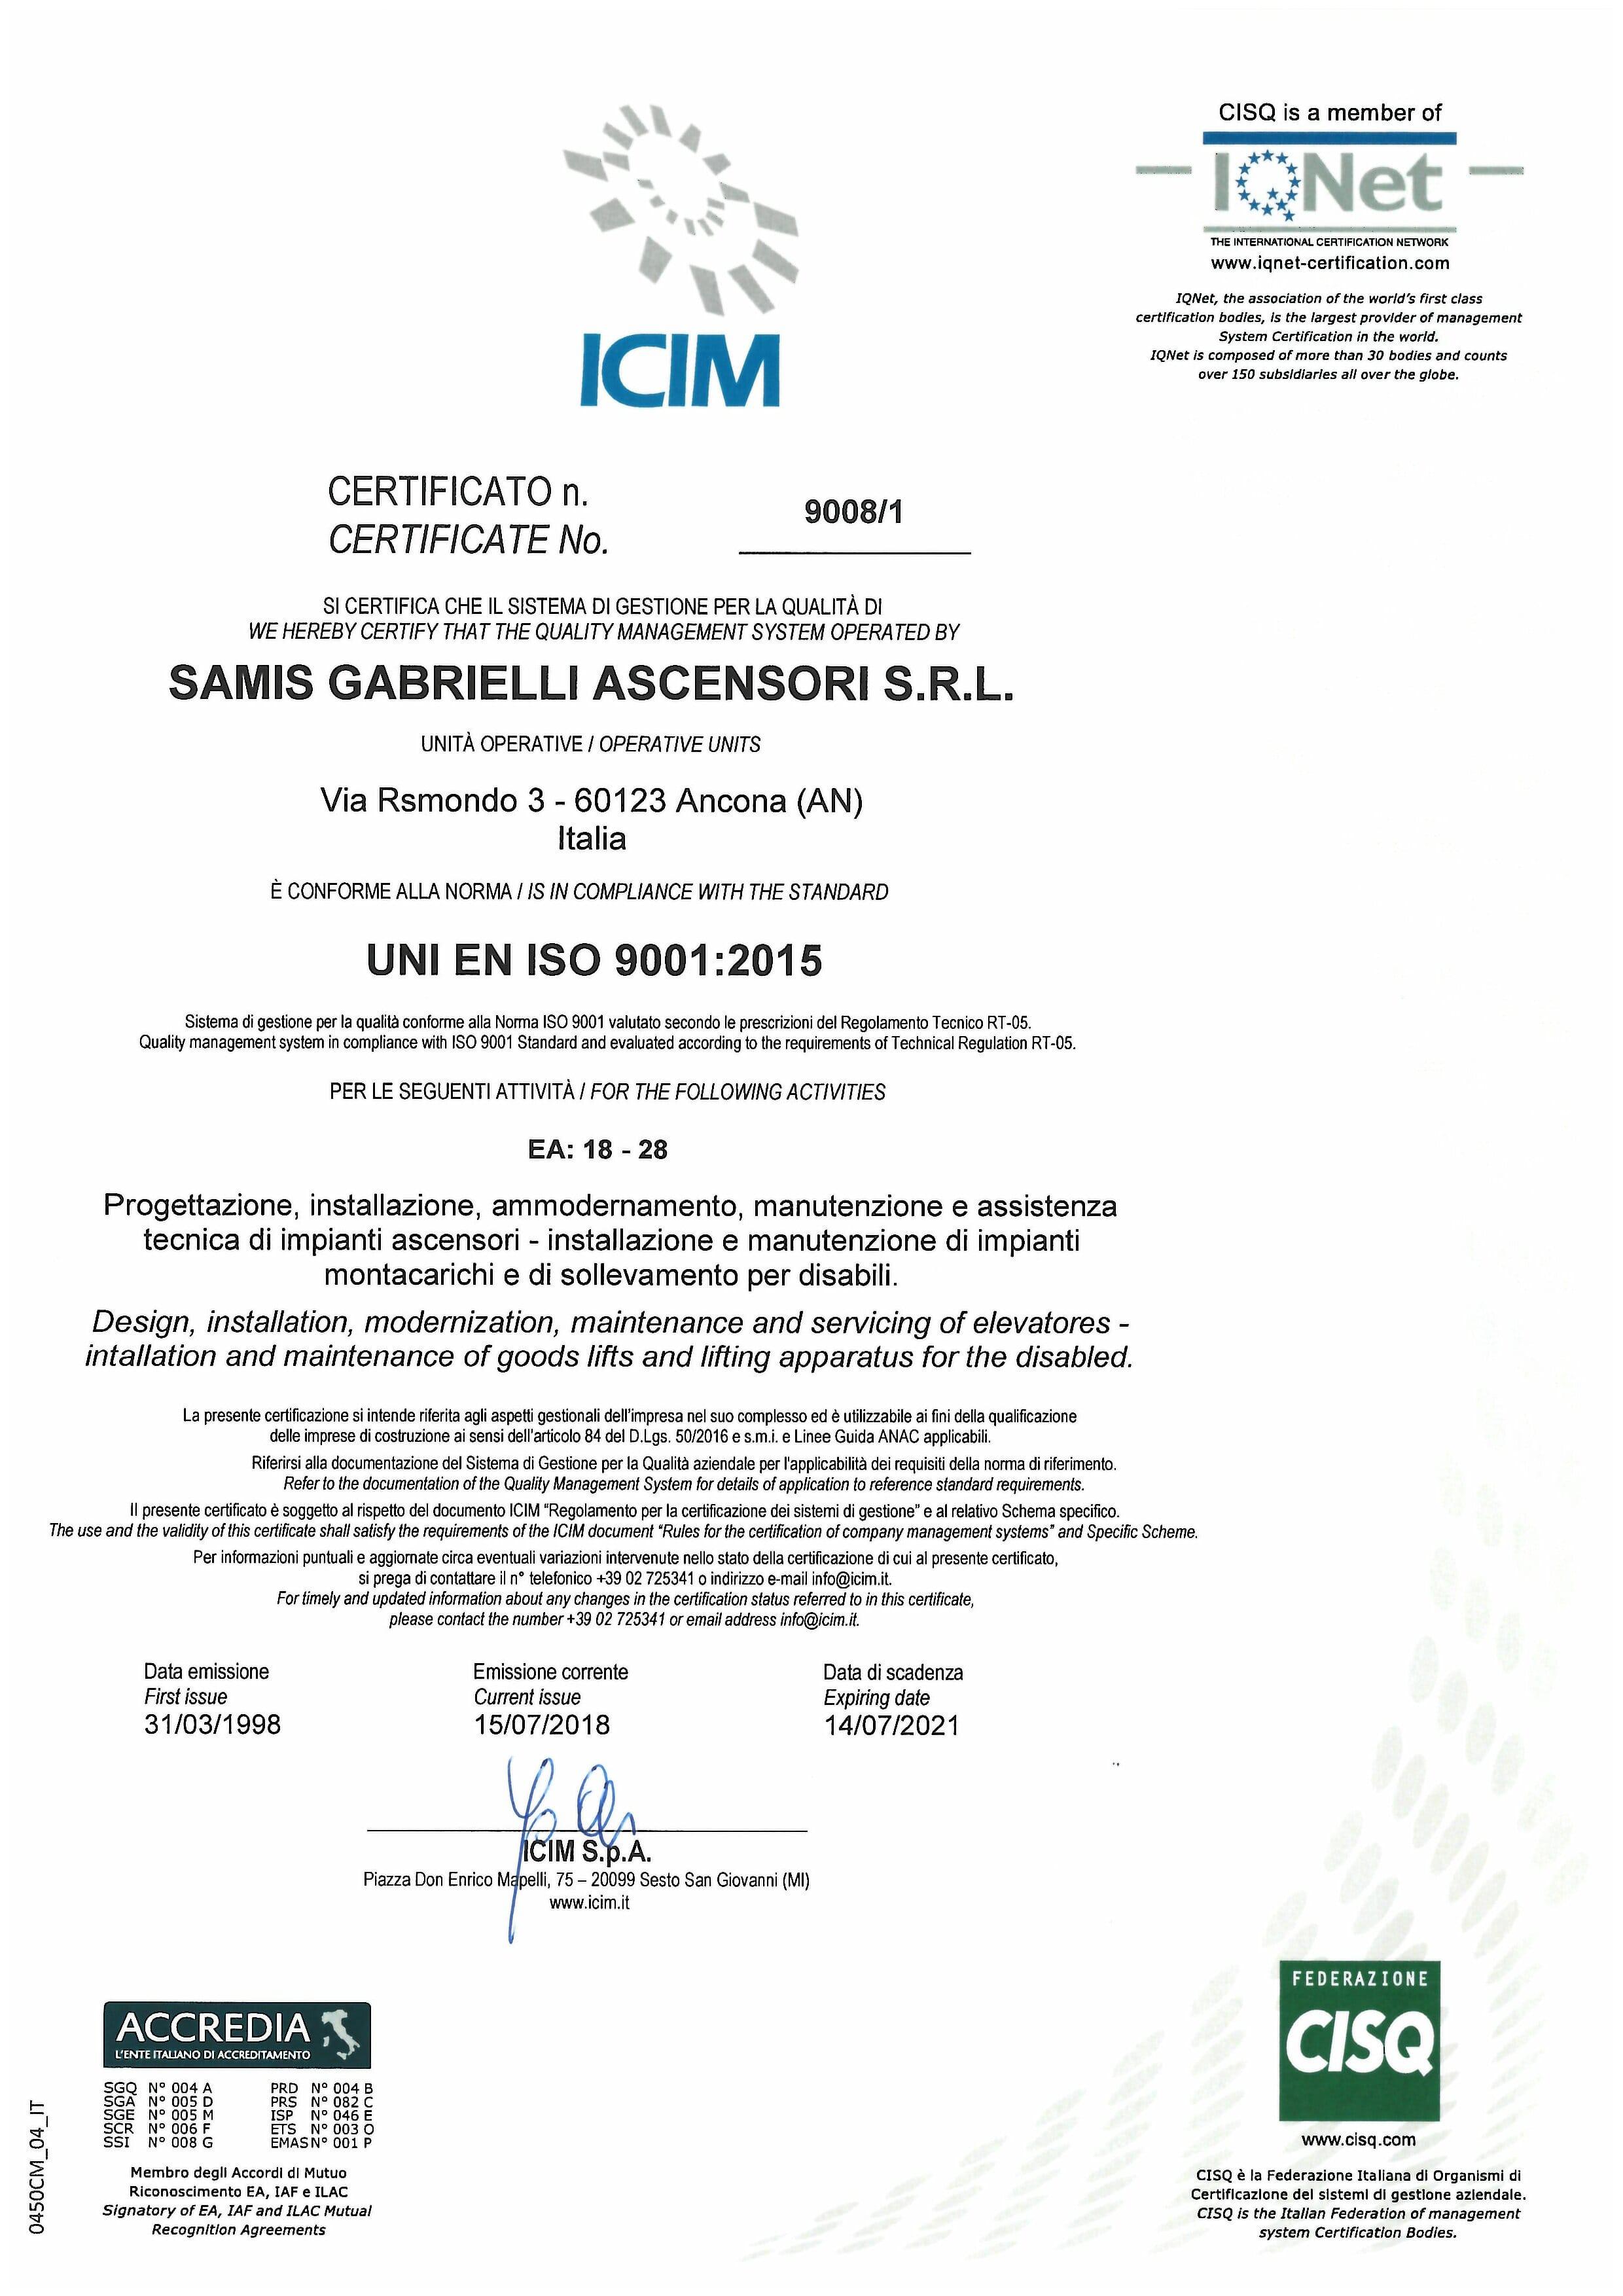 CERTITICATO ICIM ISO 9001